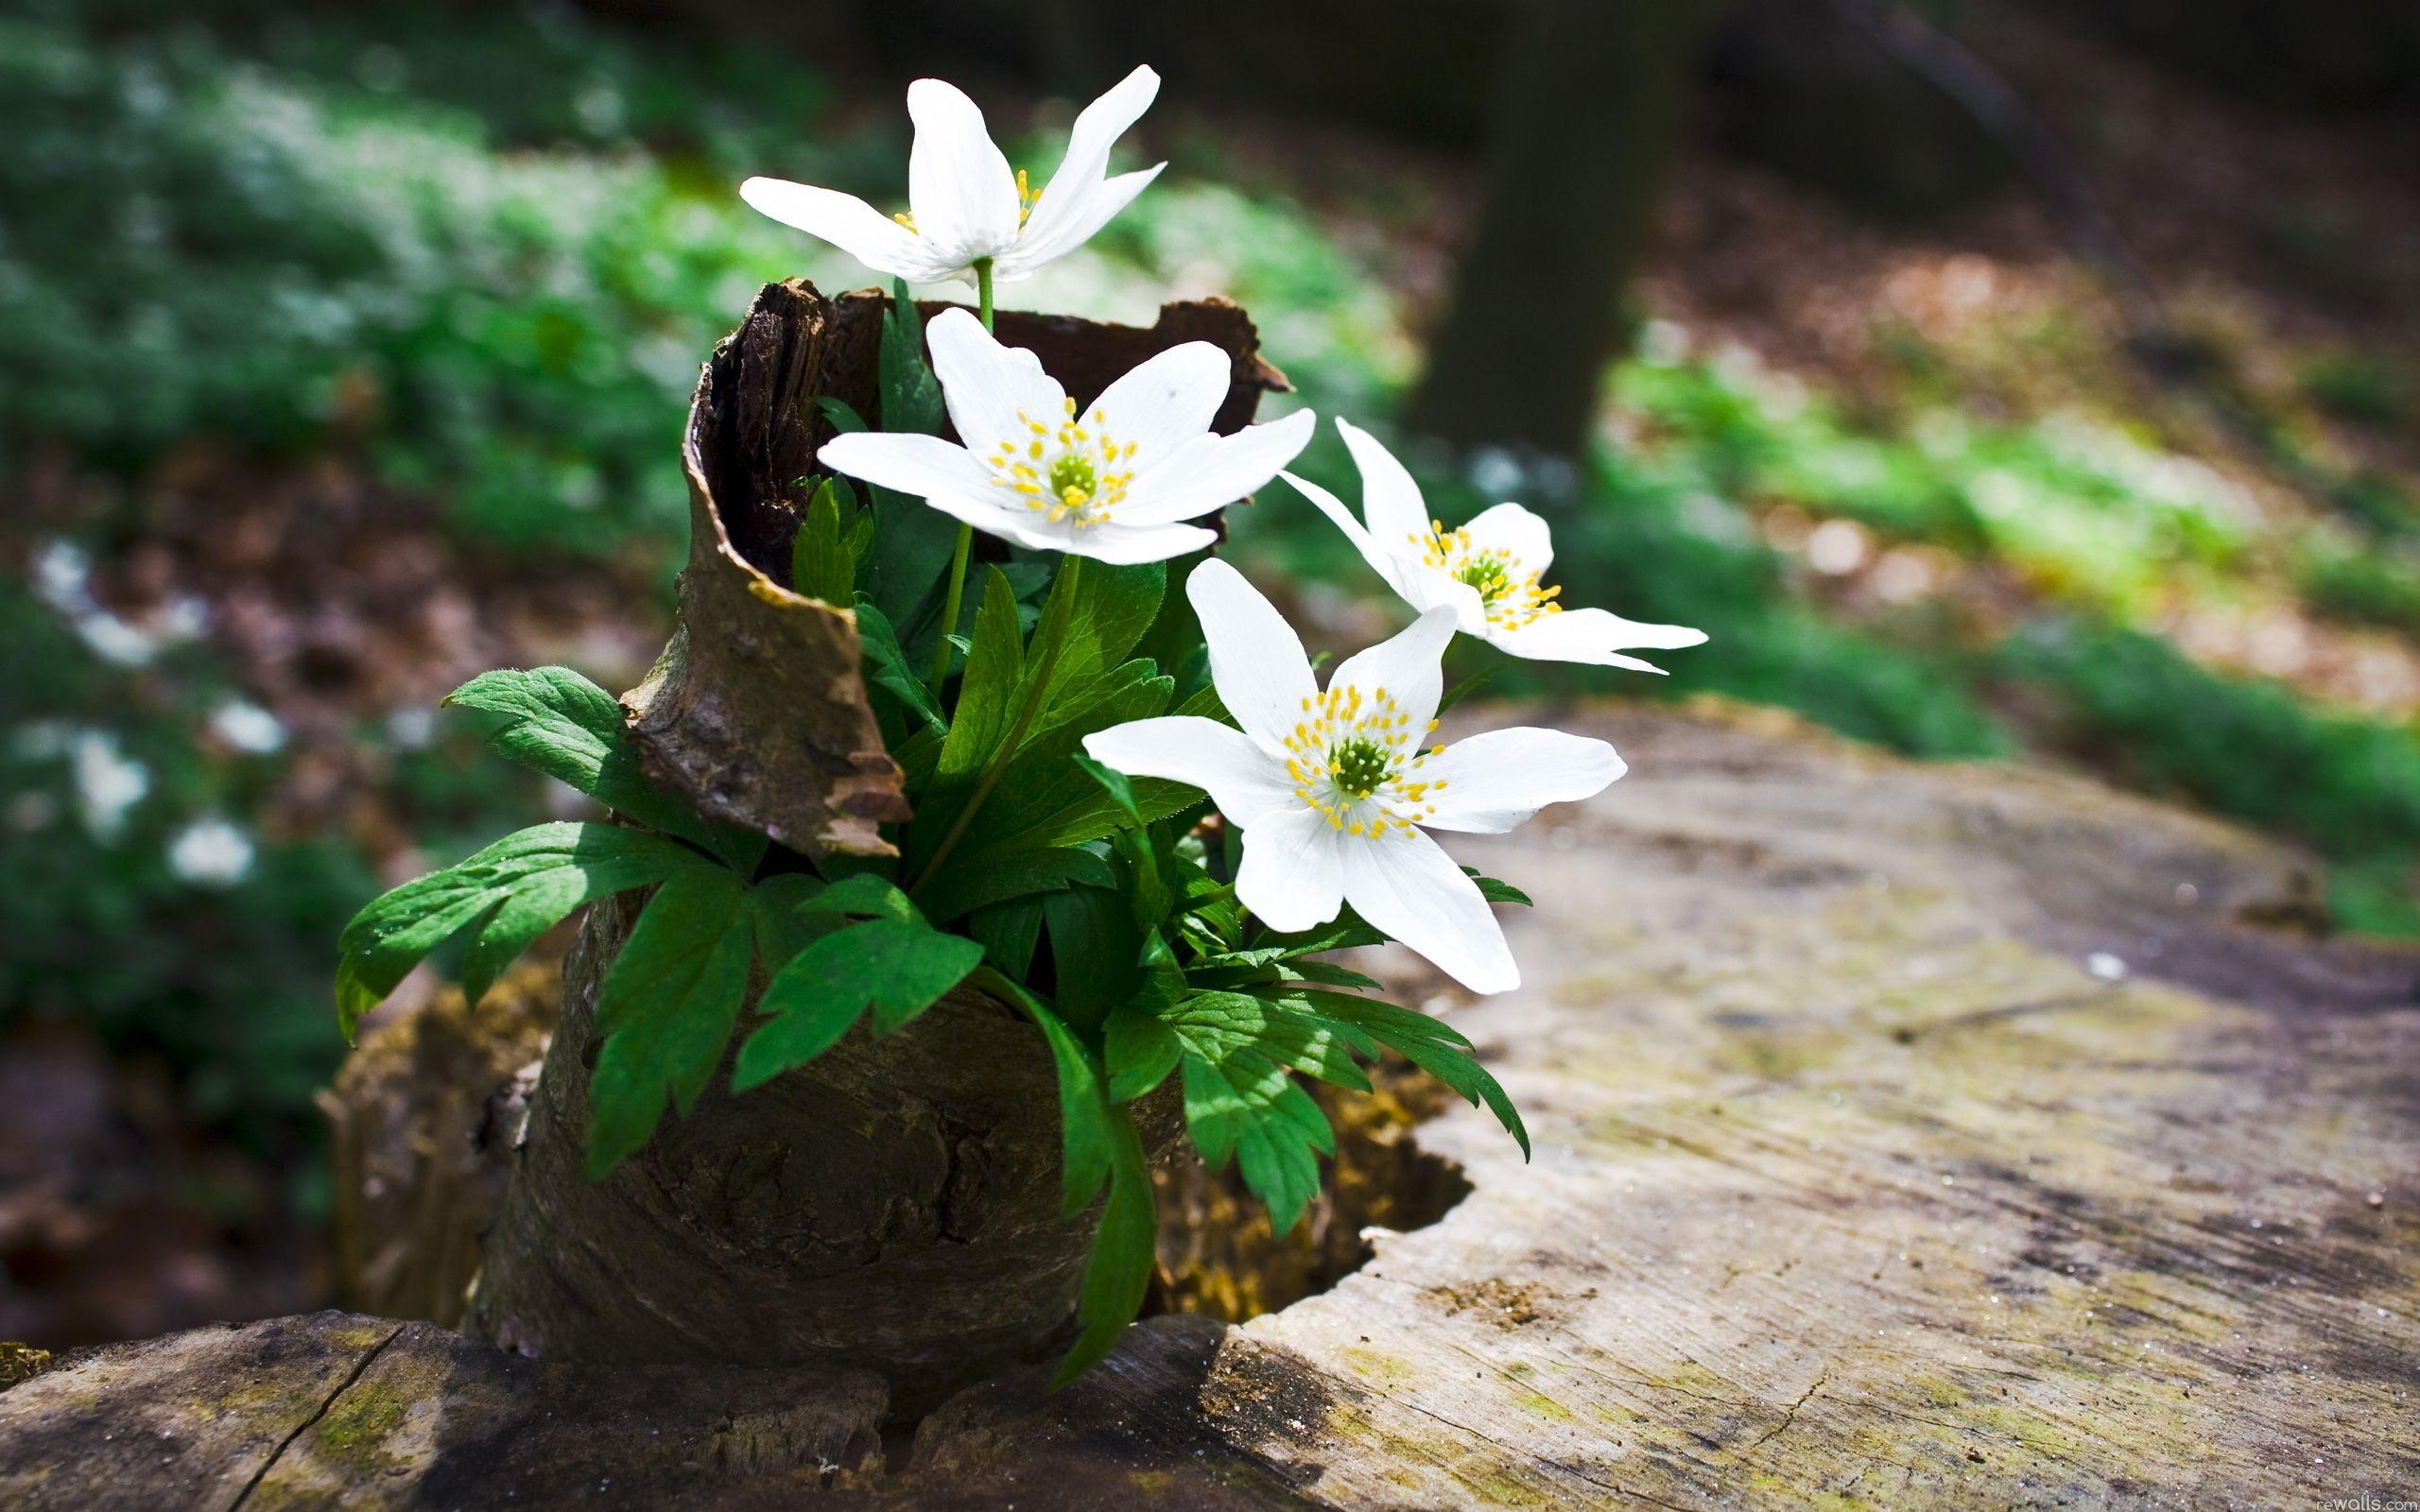 Spring flowers spring wallpaper fanpop fanclubs desktop wallpaper